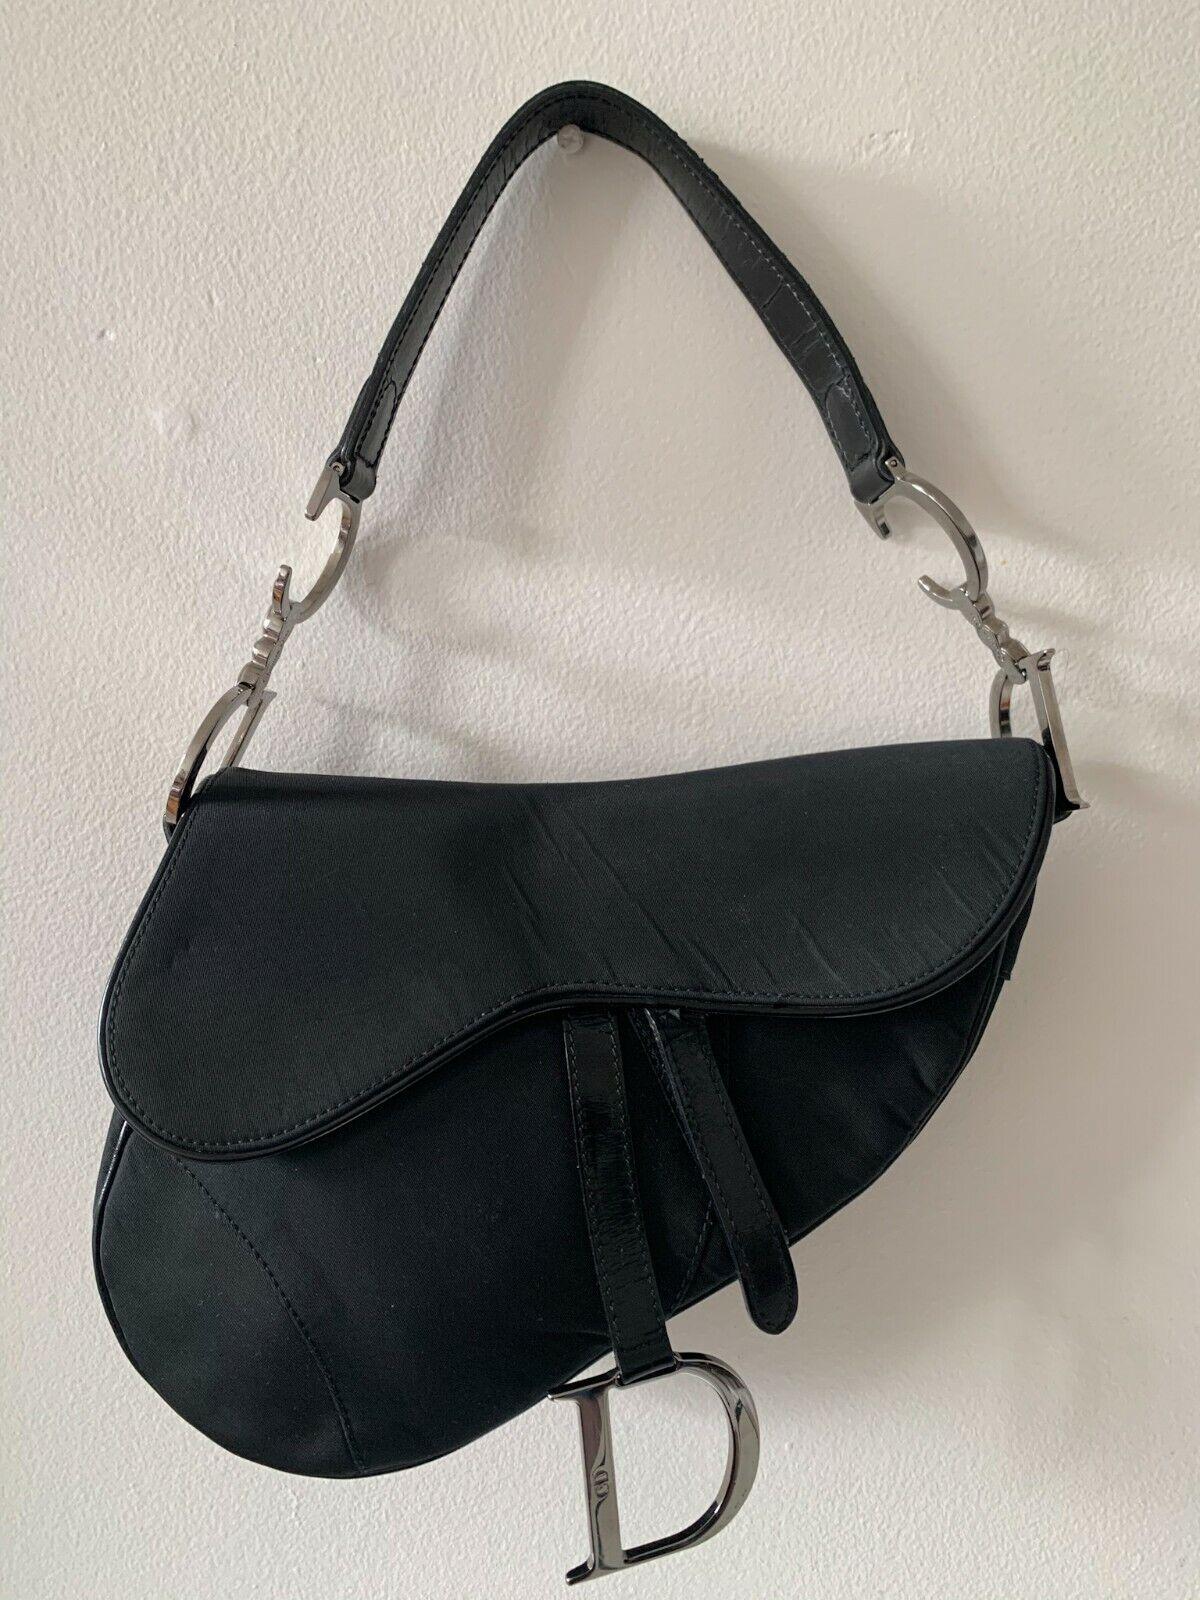 Christian Dior Black Saddle Bag Silver Hardware Collectible Vintage - $994.00